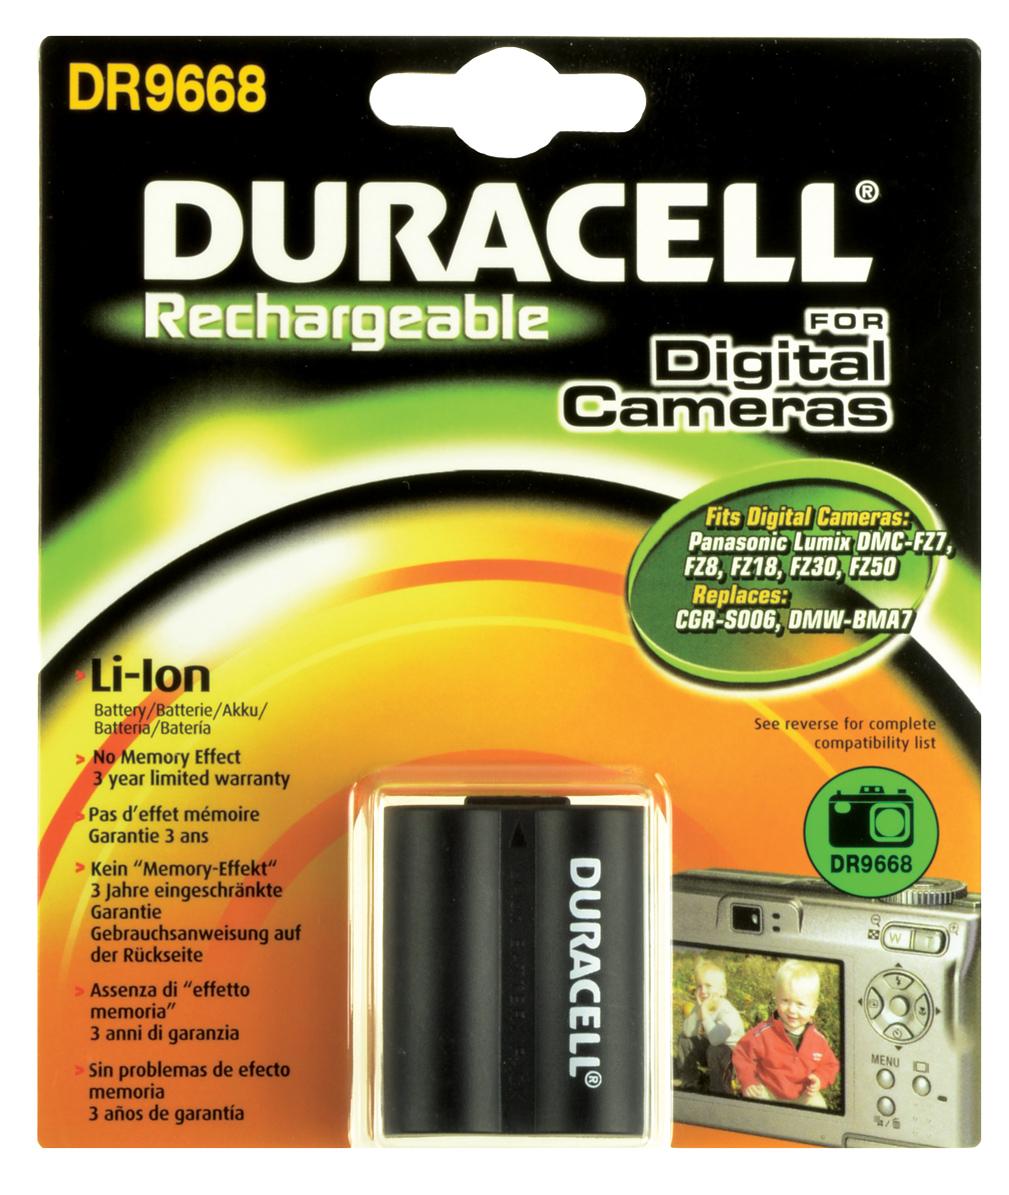 Baterie do fotoaparátu Panasonic Lumix DMC-FZ50EF/DMC-FZ50EGM/DMC-FZ50K/DMC-FZ50S/DMC-FZ7/DMC-FZ7-S/DMC-FZ7BB/DMC-FZ7BS/DMC-FZ7EB-K/DMC-FZ7EB-S,…